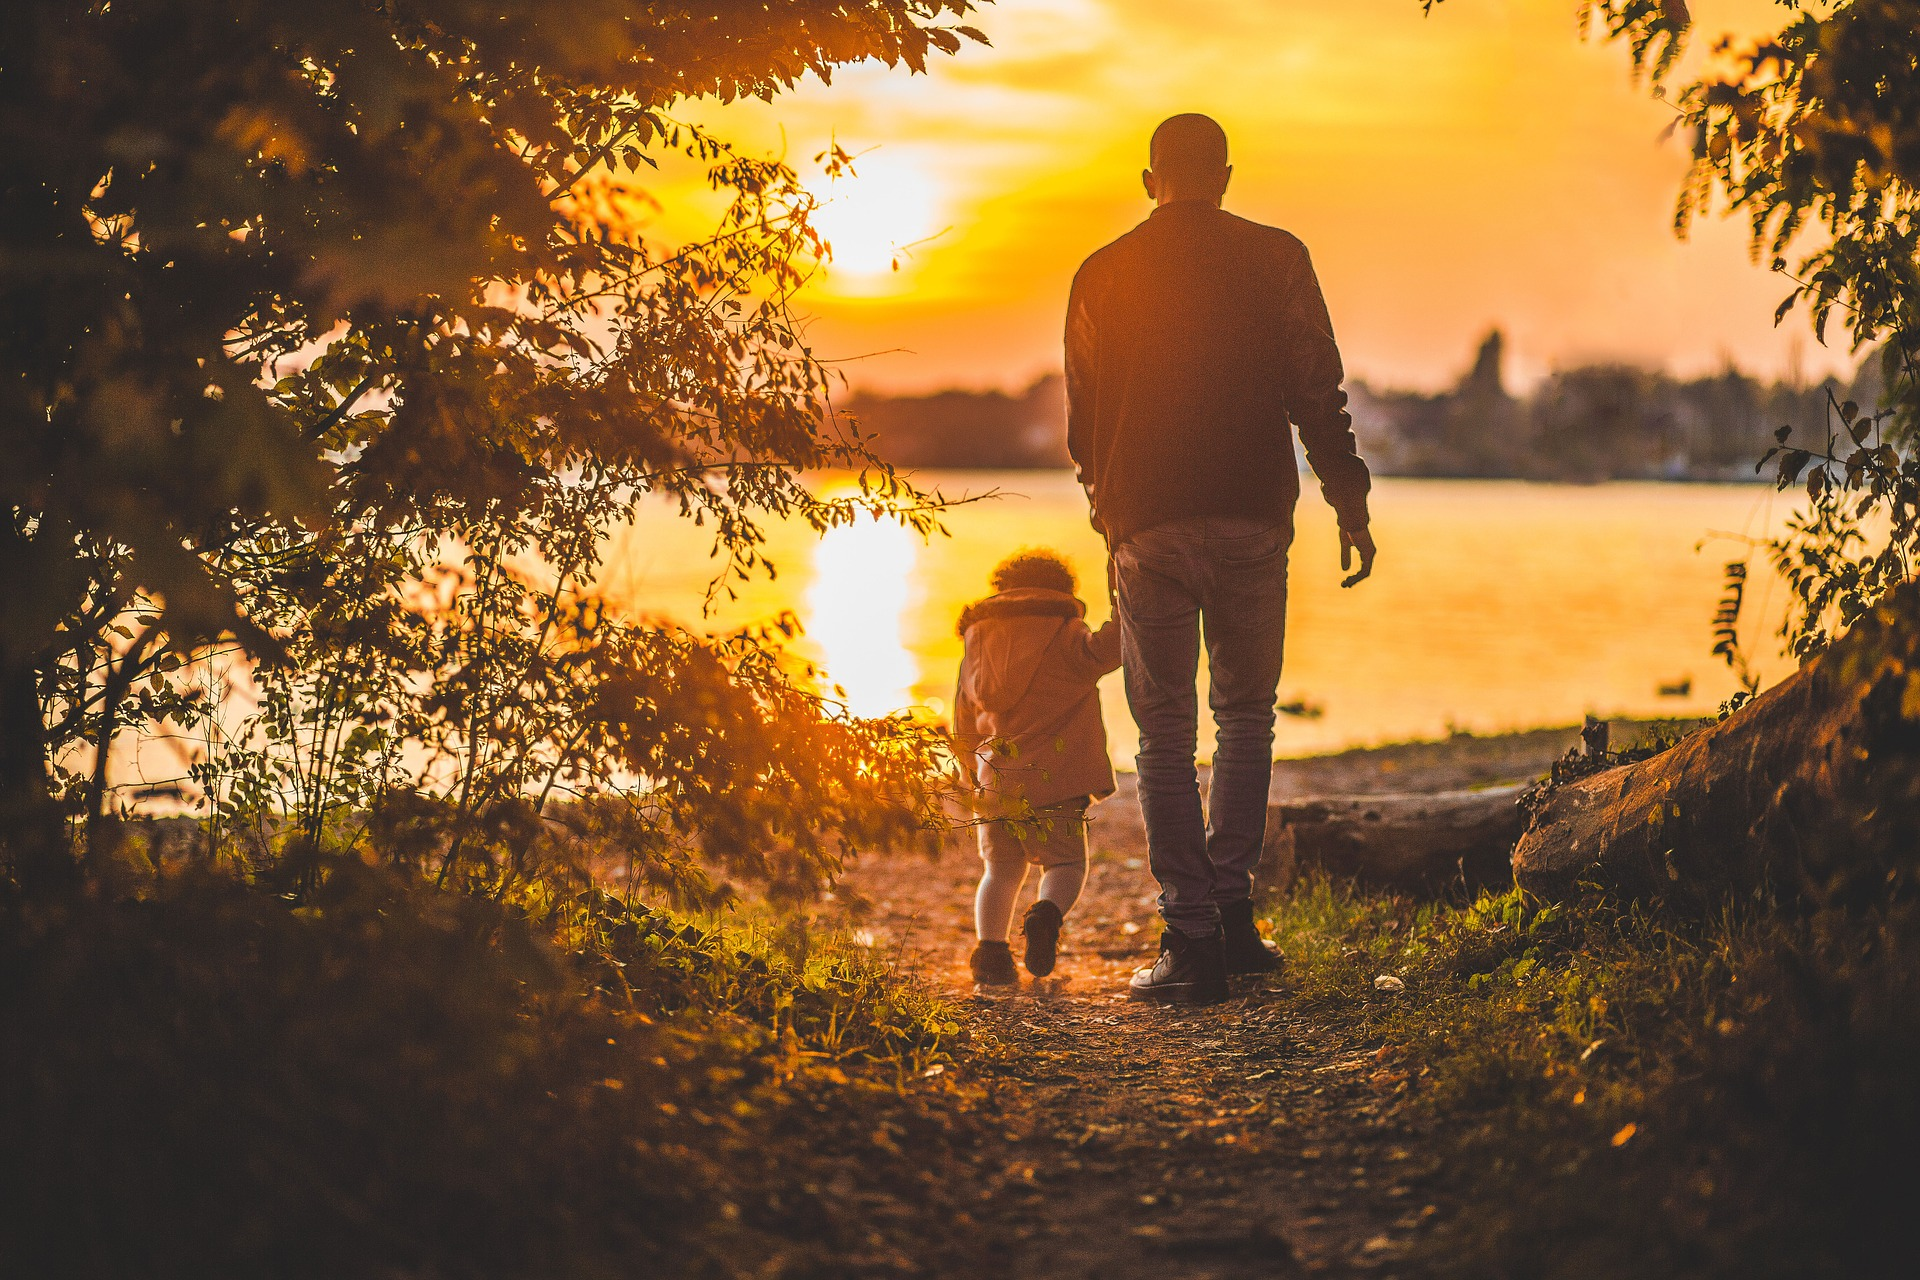 vader mag kind niet zien na scheiding